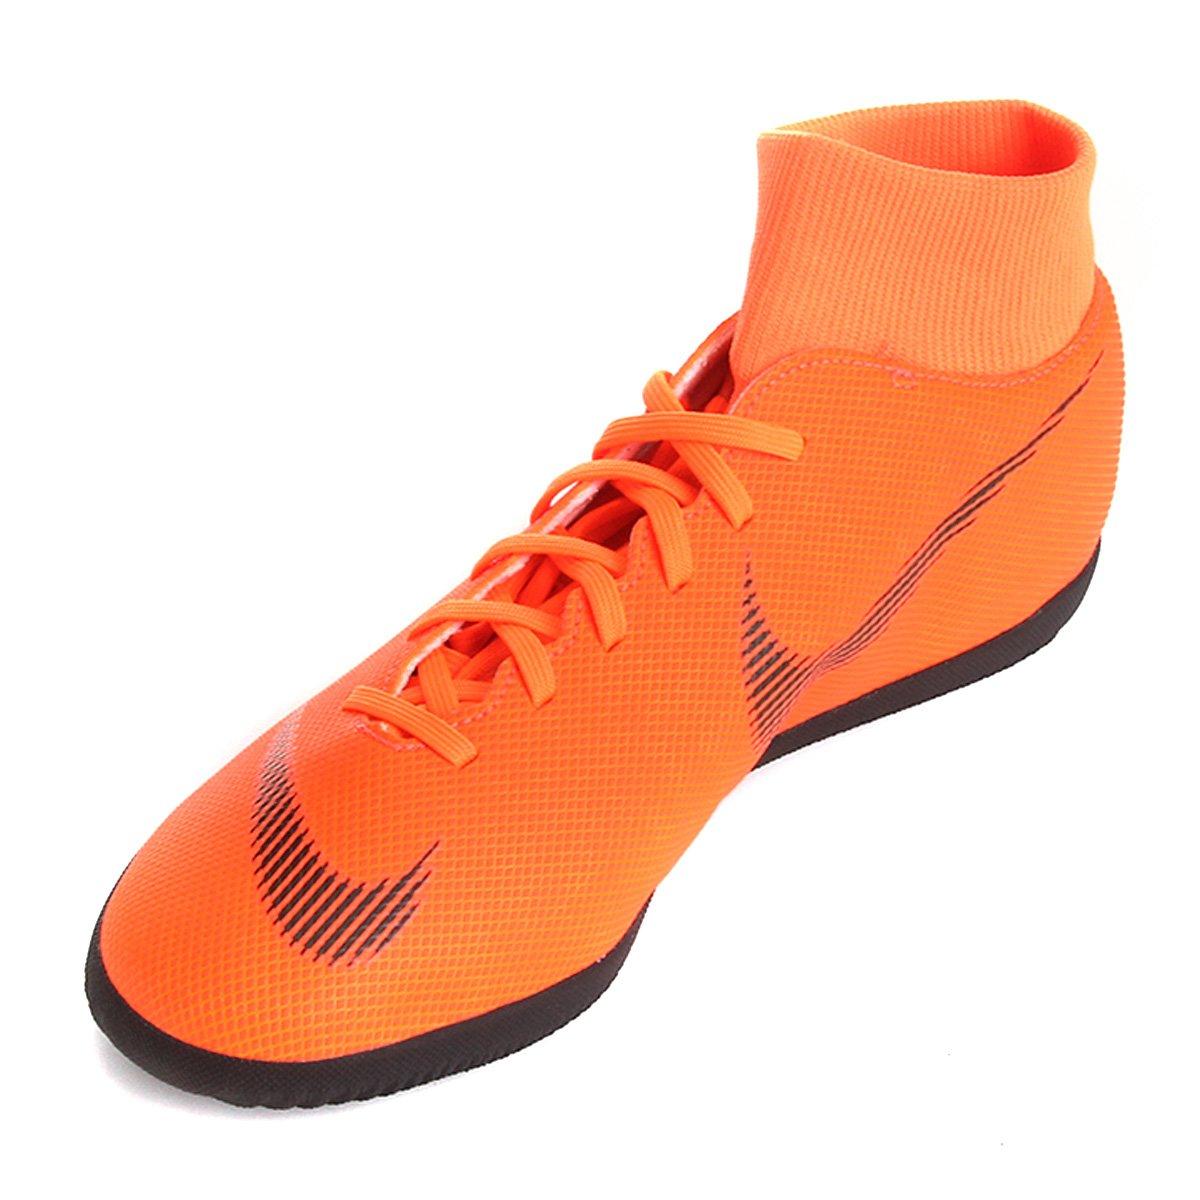 Chuteira Futsal Nike Mercurial Superfly 6 Club - Laranja e Preto ... a272e53f61053